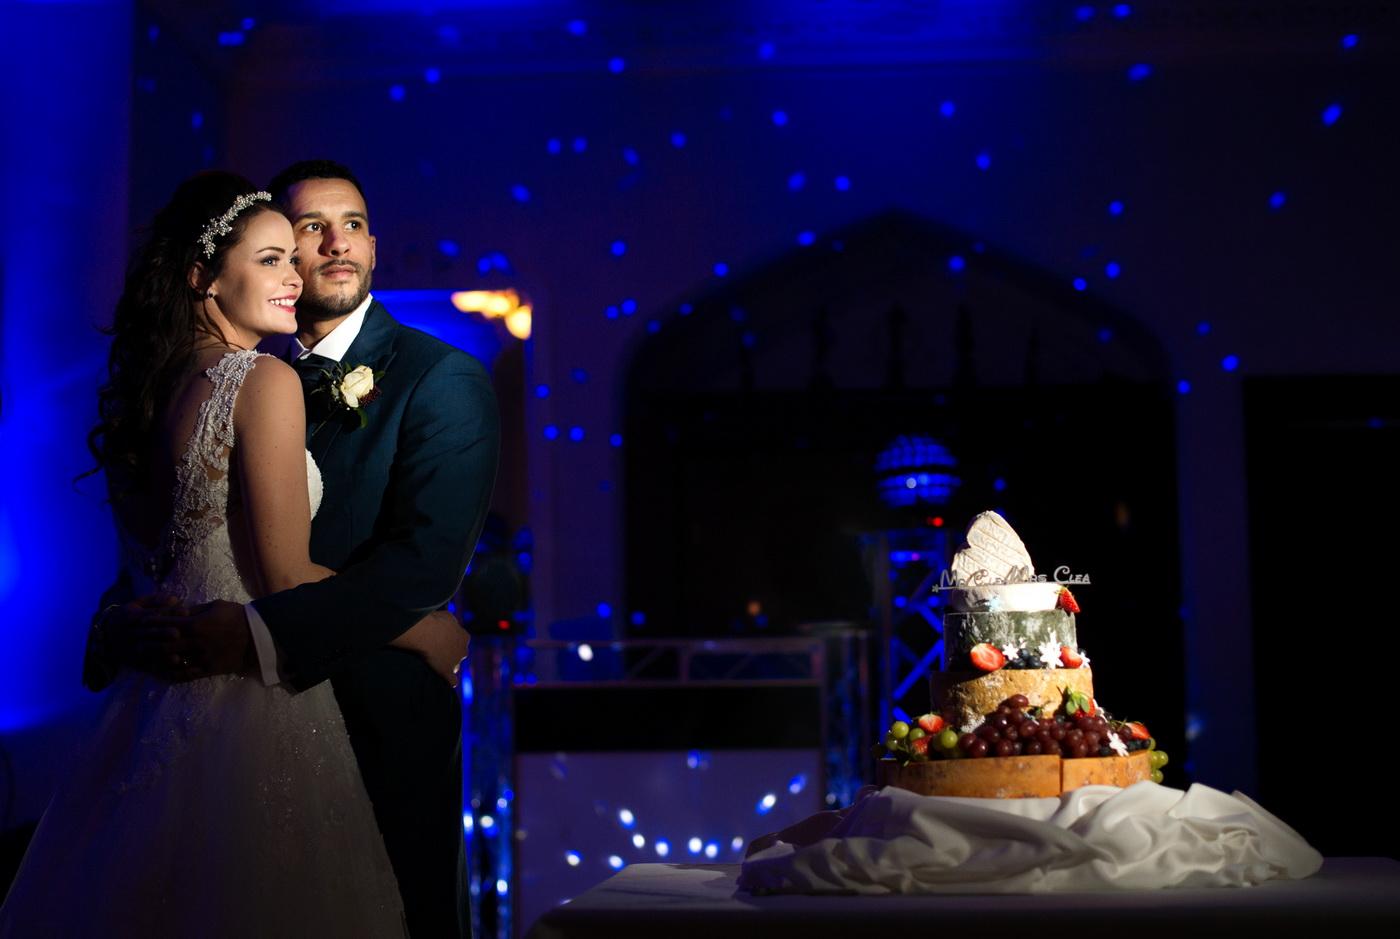 Destination Wedding Photographer_Marian Sterea_216.jpg